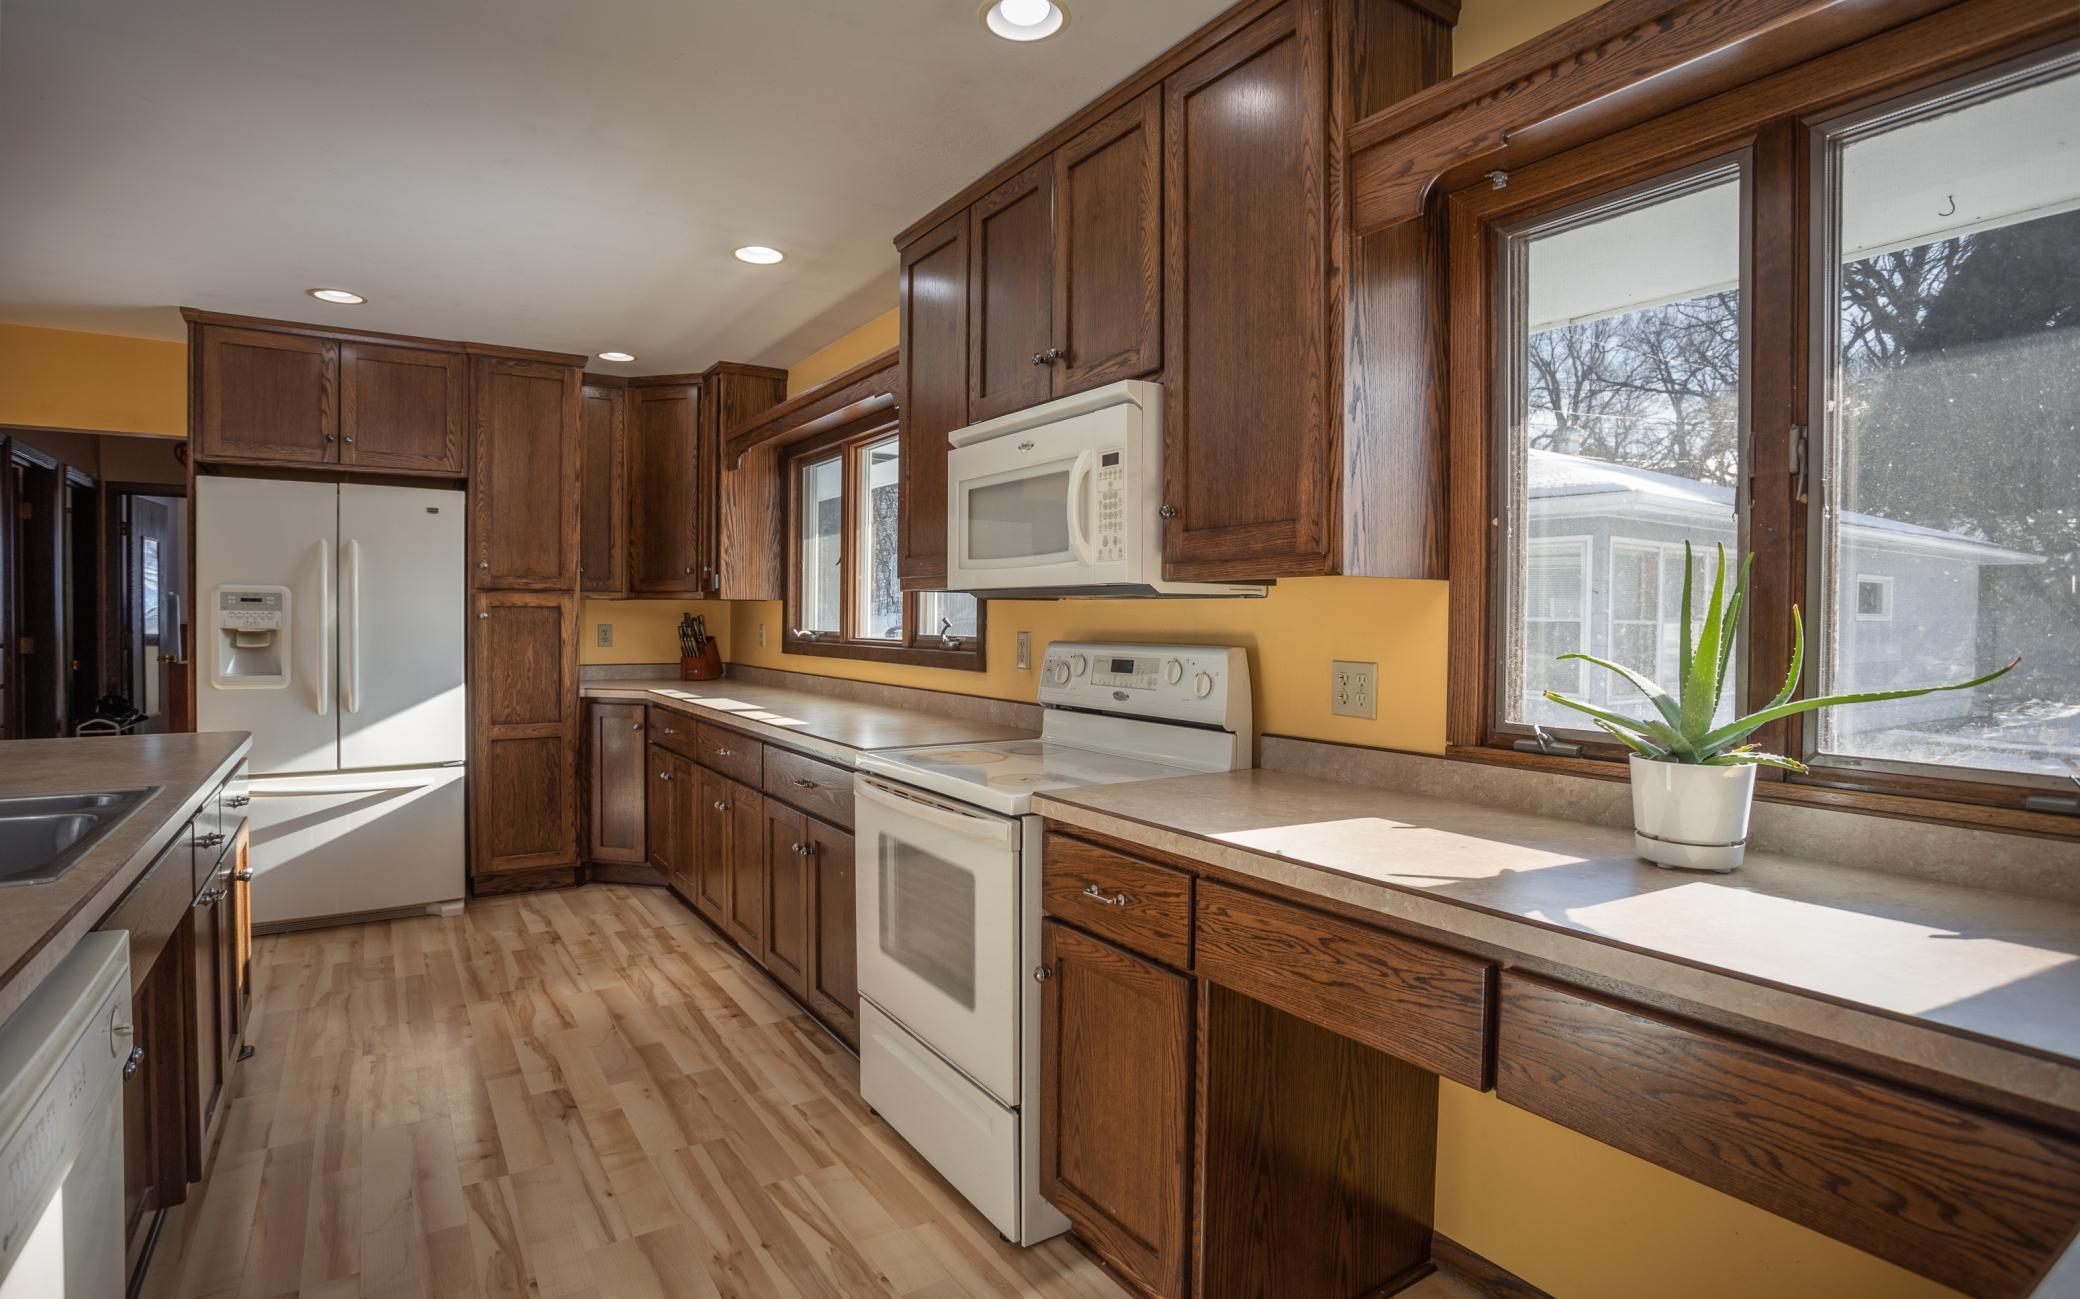 830 1st Avenue NE Property Photo - Glenwood, MN real estate listing